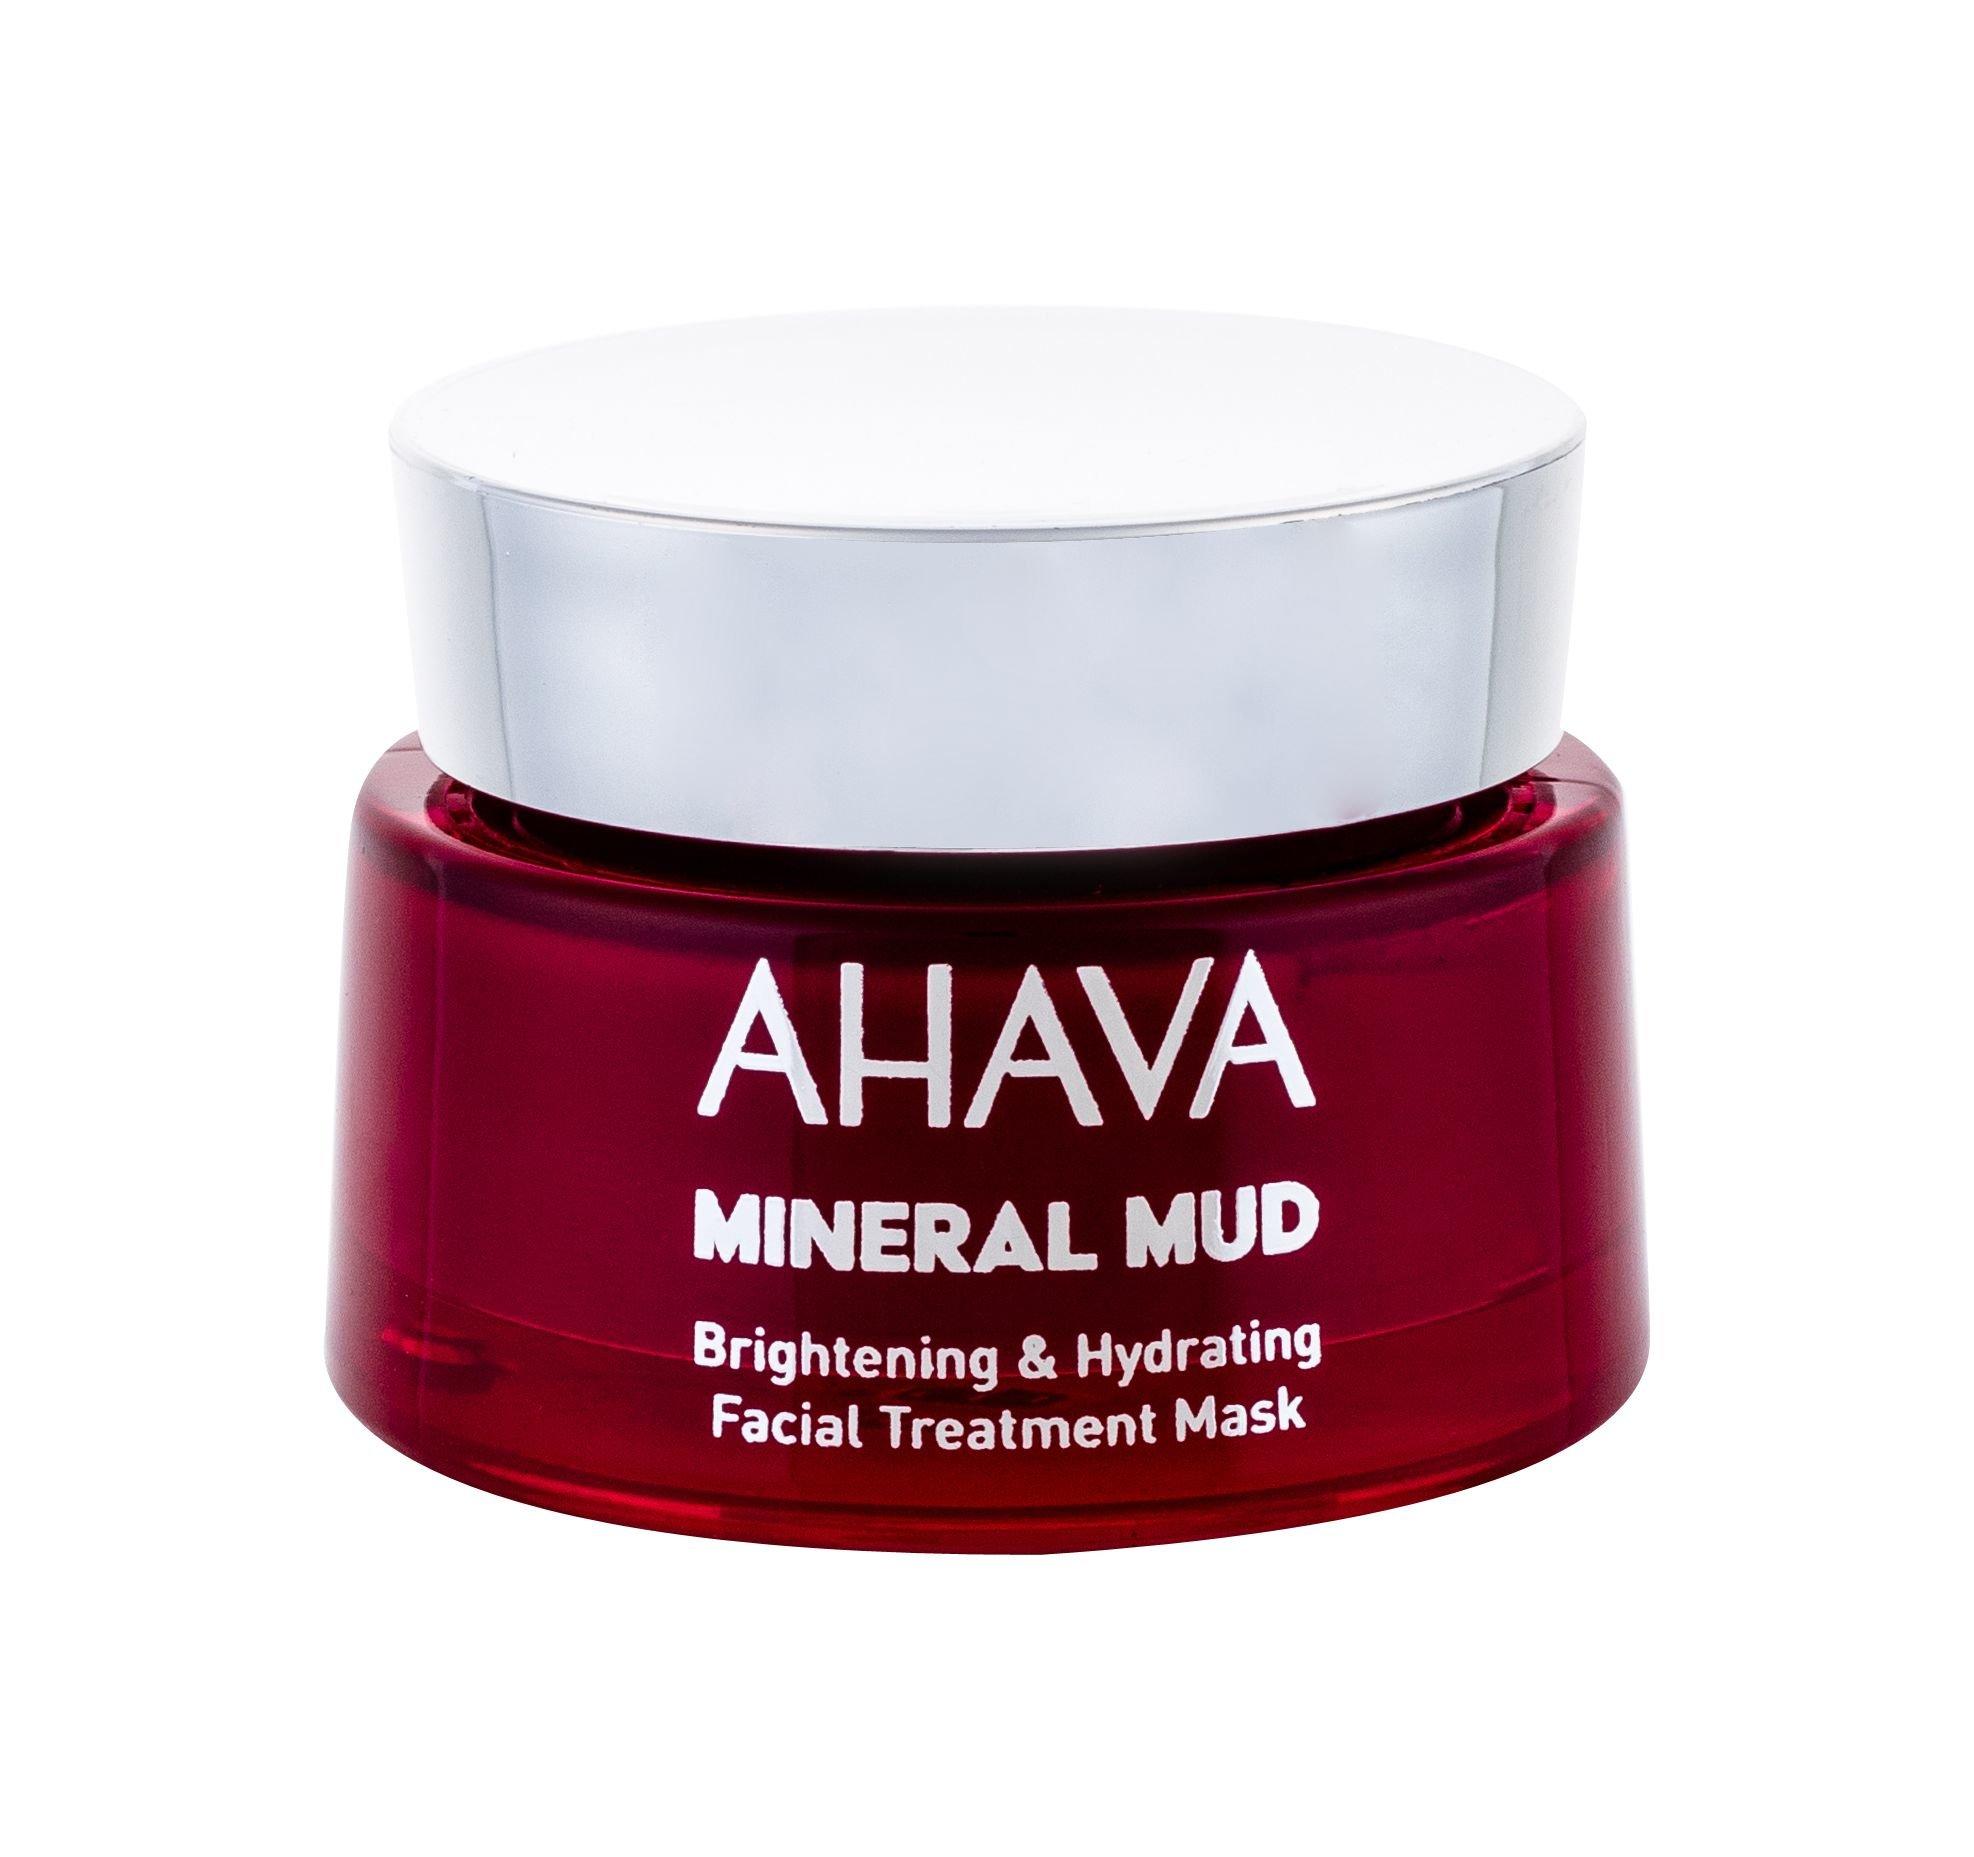 AHAVA Mineral Mud Face Mask 50ml